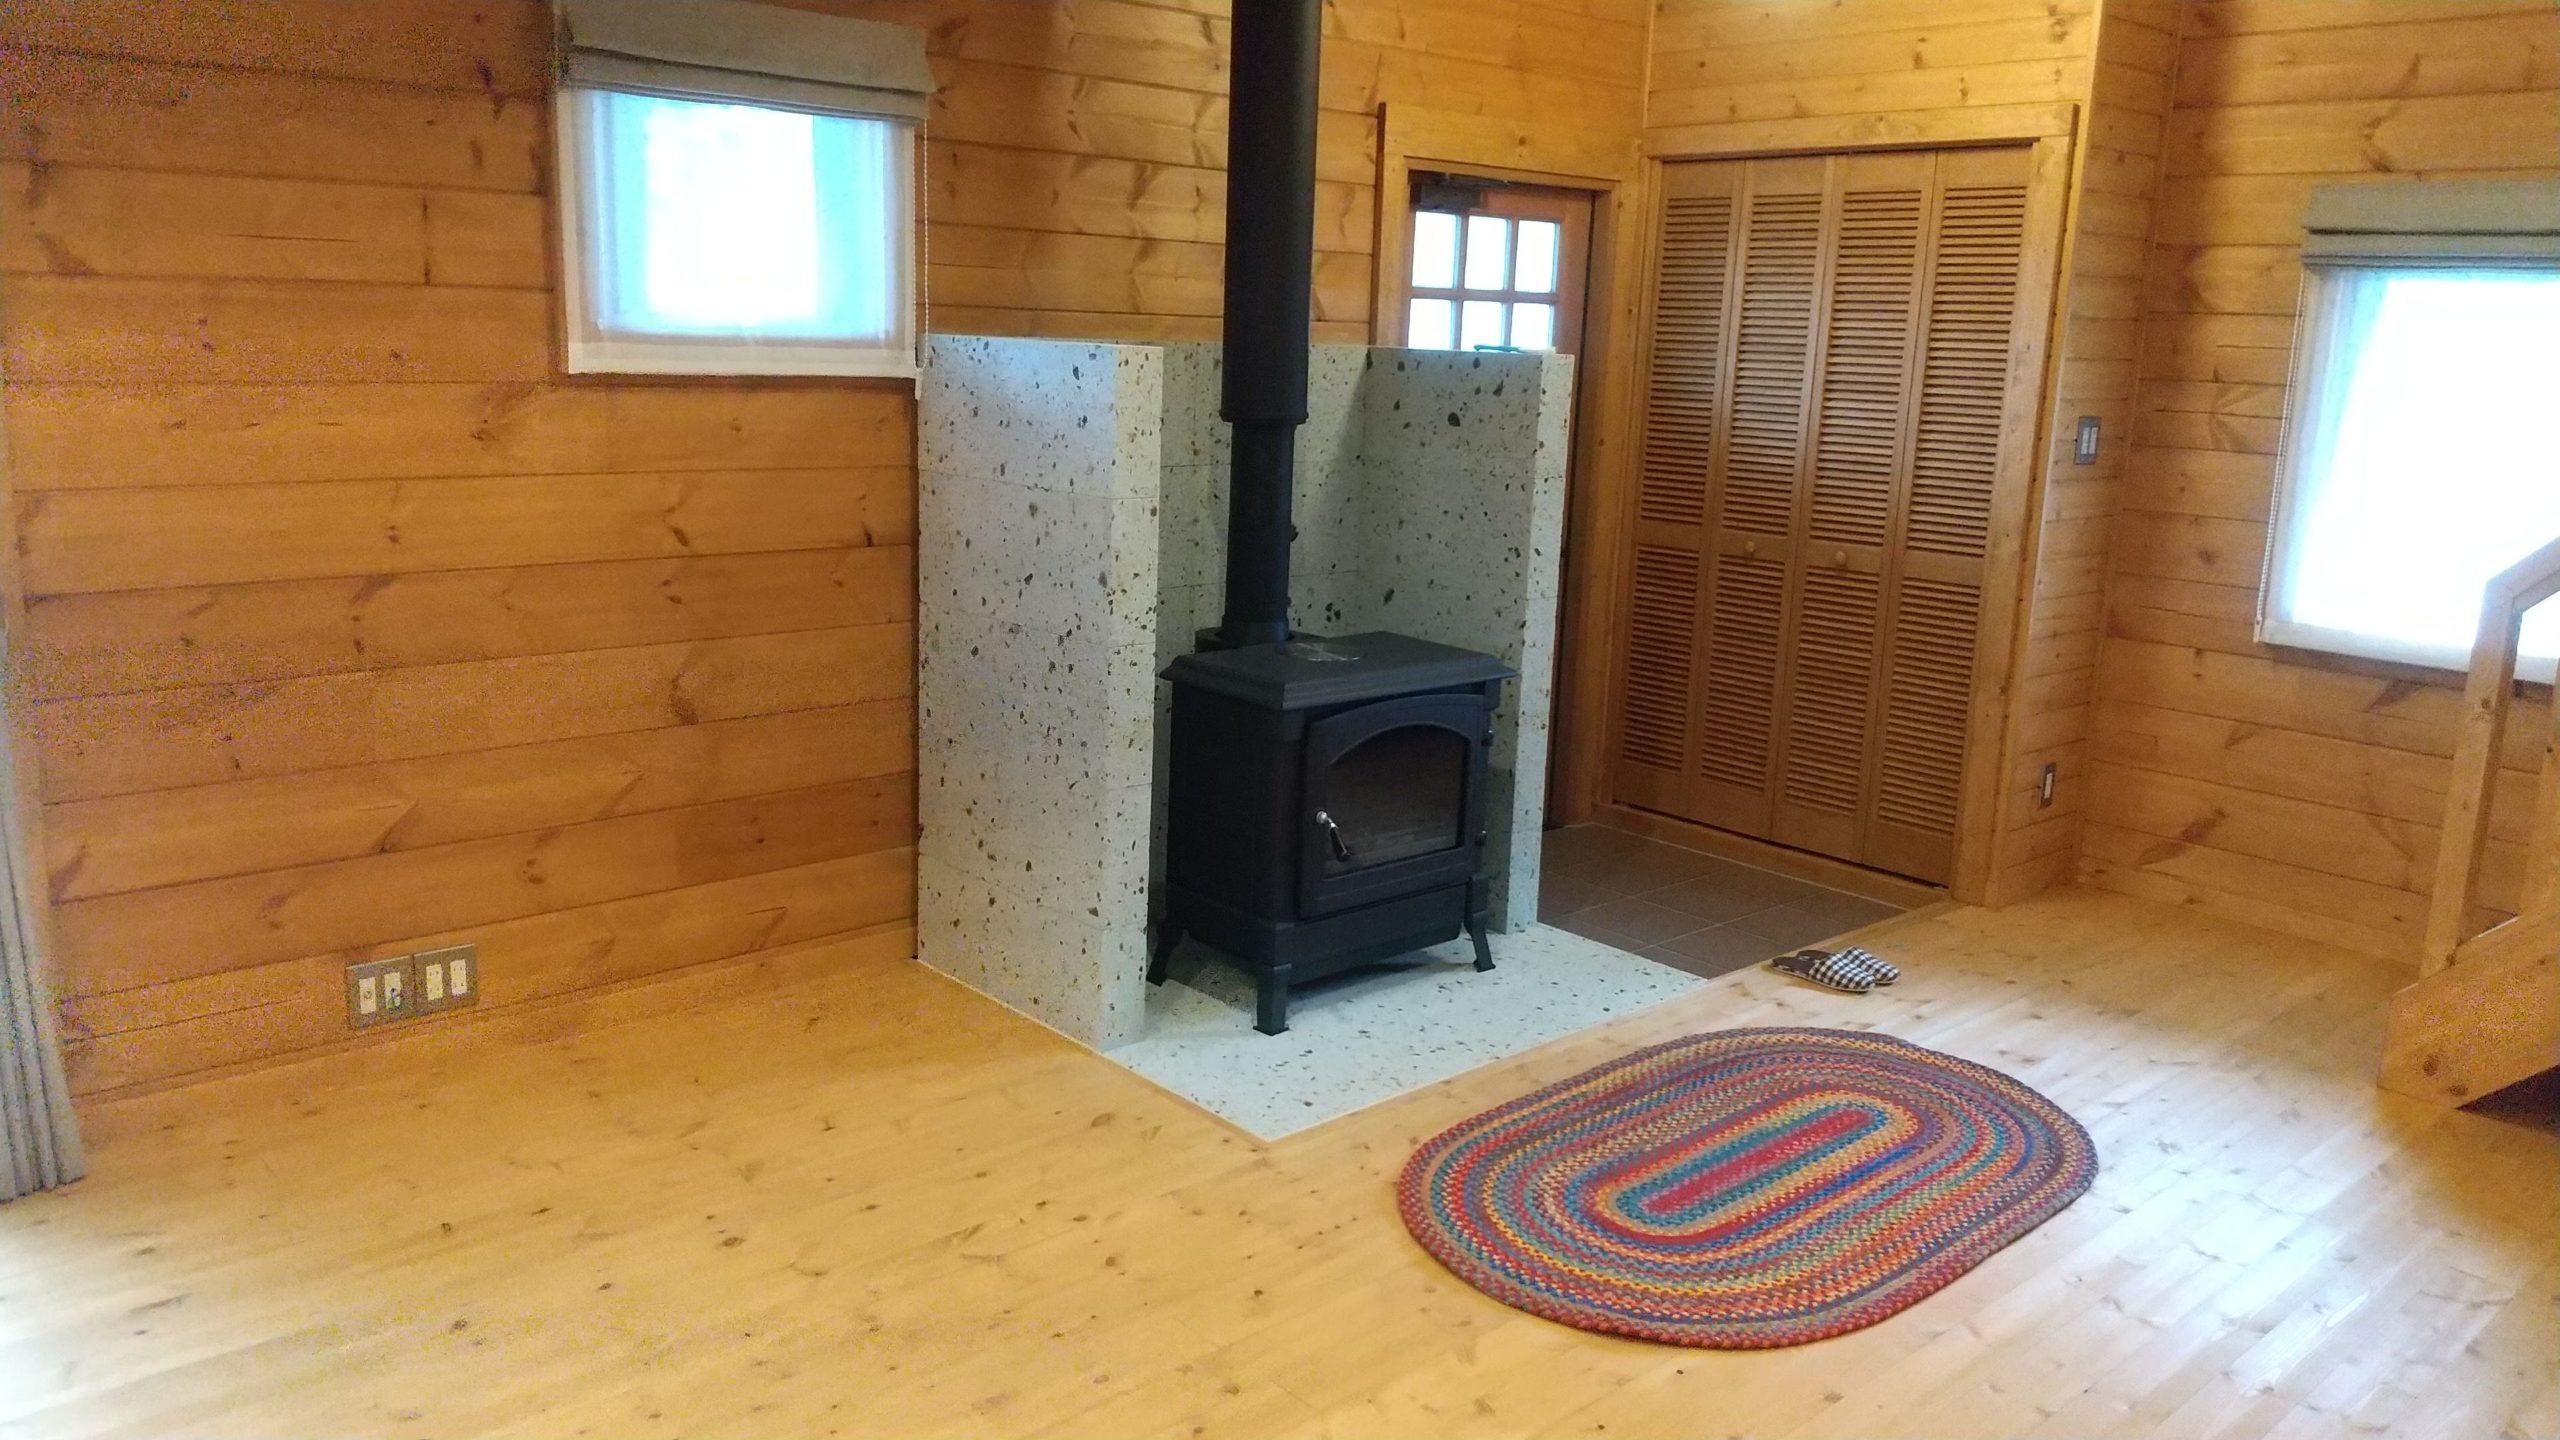 BESS栃木様施工で玄関入った土間の脇の薪ストーブです。